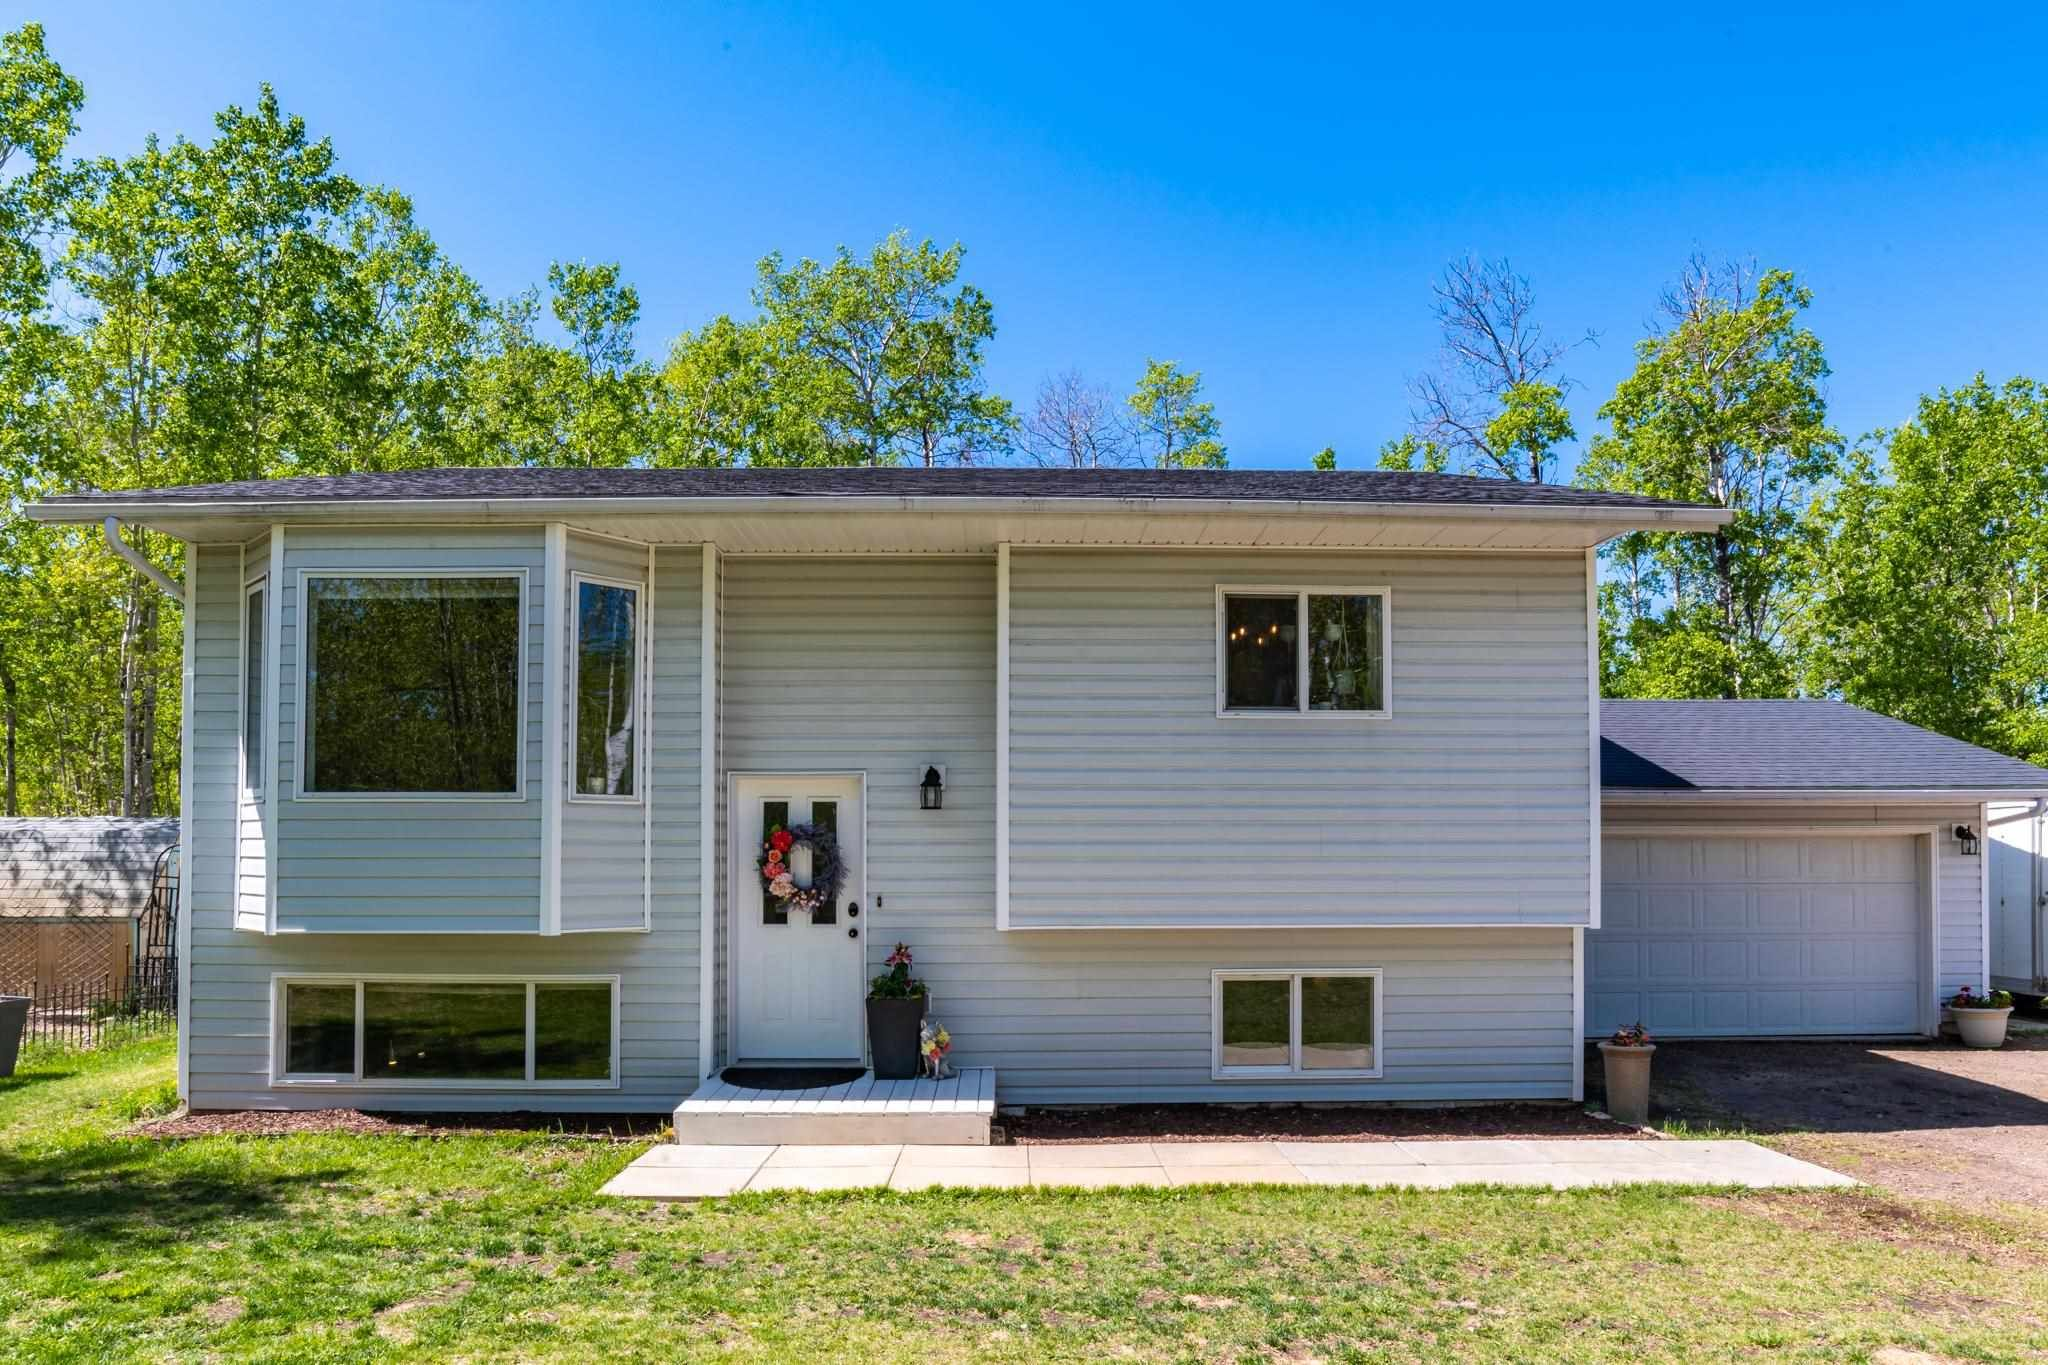 Main Photo: 63010B Rge Rd 412: Rural Bonnyville M.D. House for sale : MLS®# E4239336